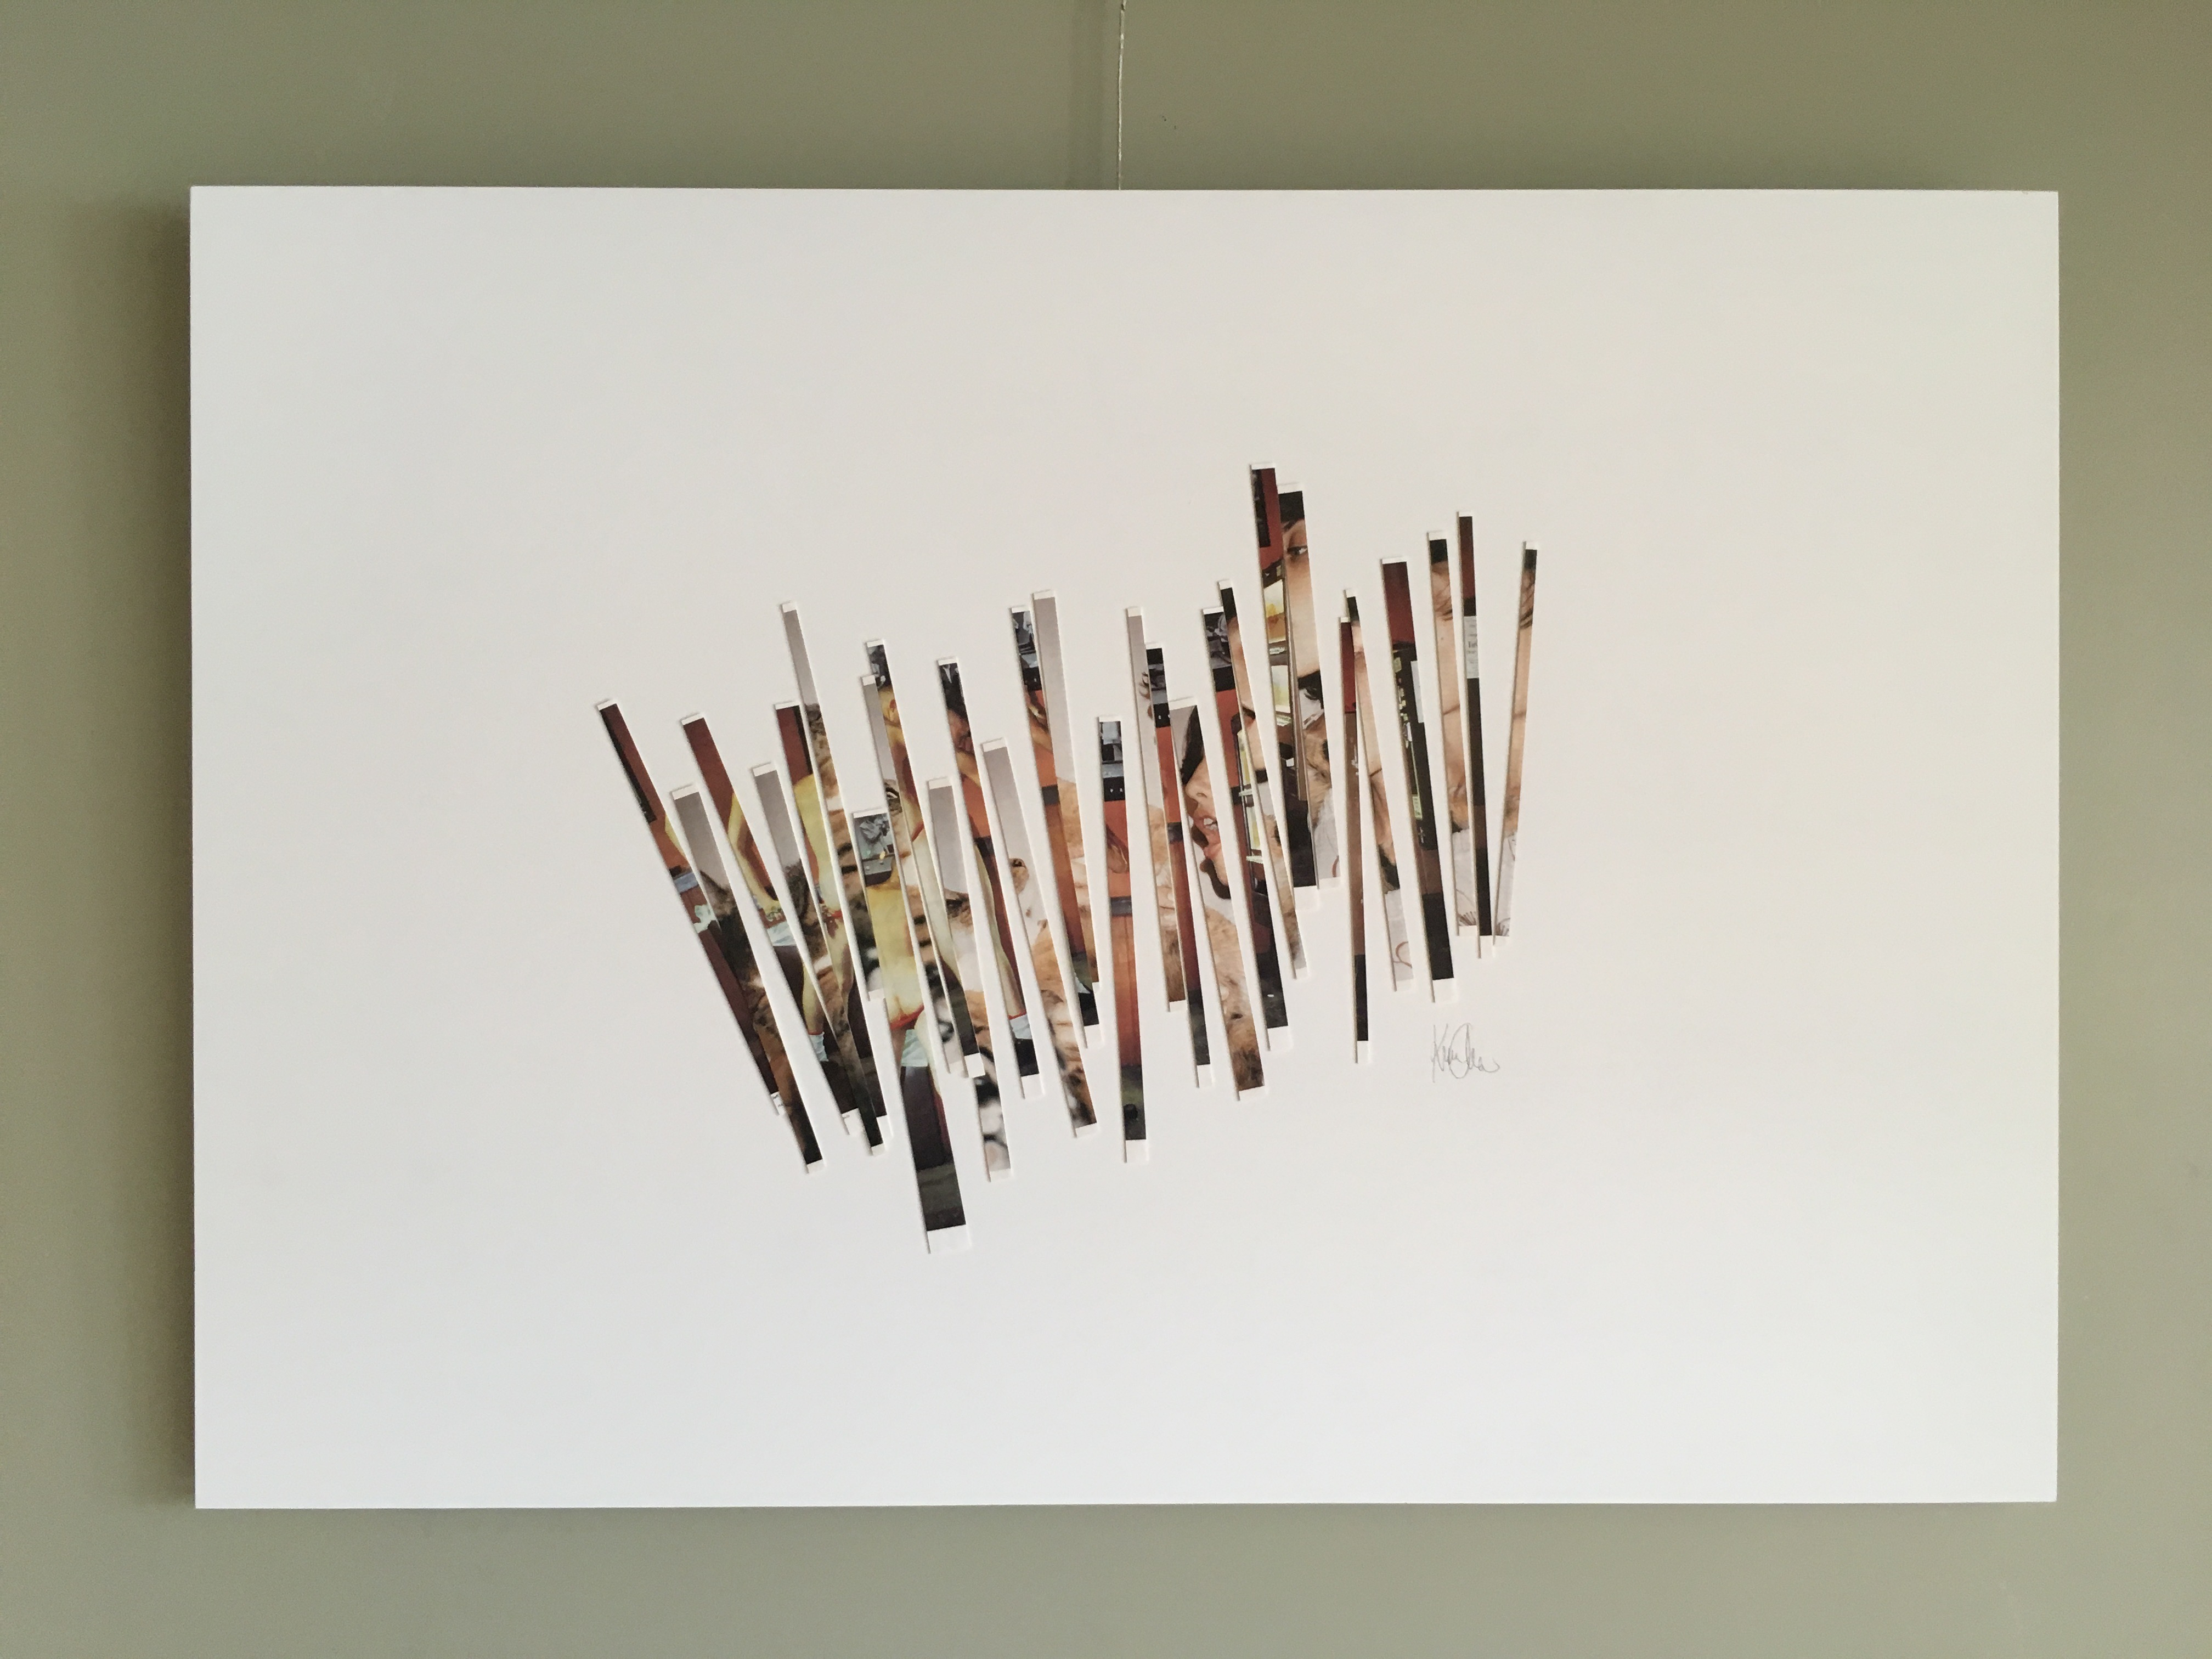 2017-cv-02 CigarettesAnd HalfHungSocks